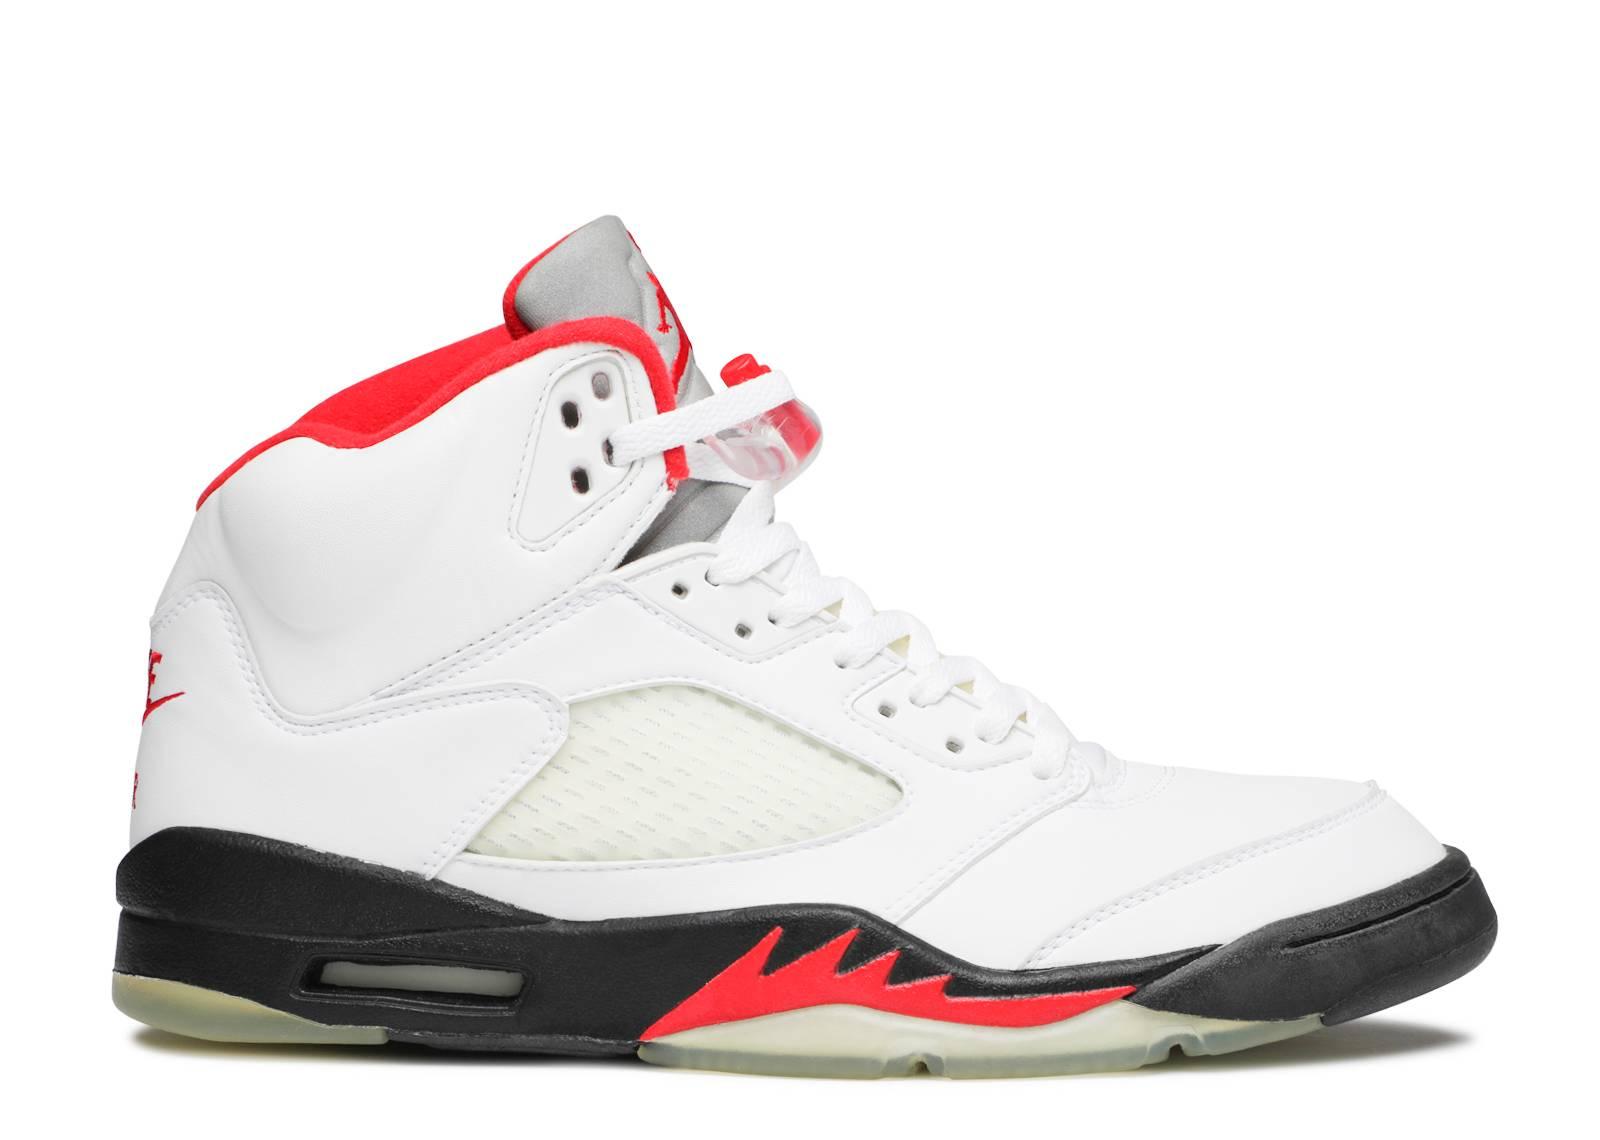 41385a92a40 Air Jordan 5 Retro